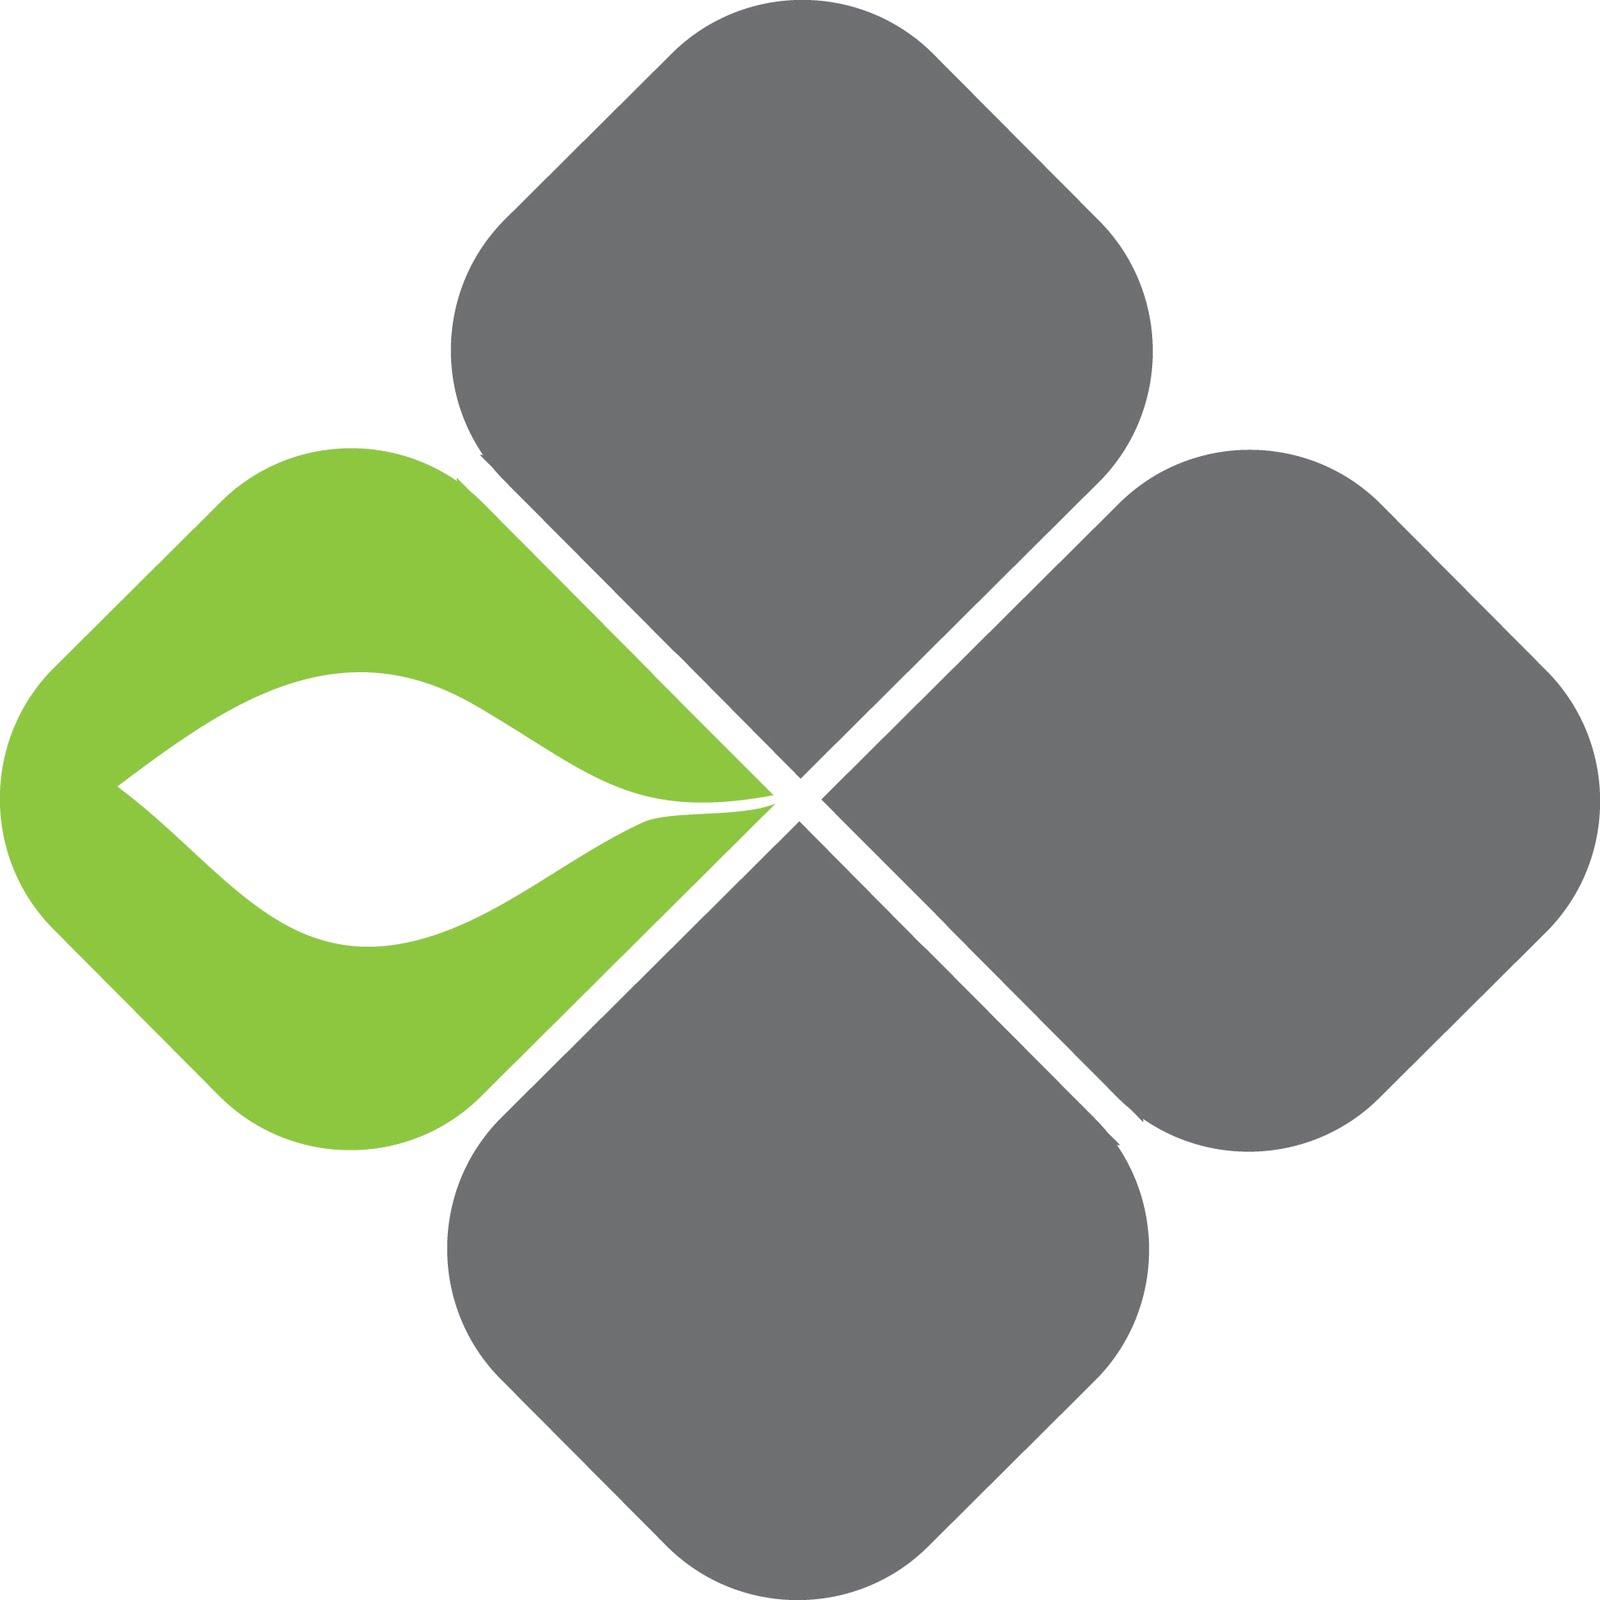 Abe s symbols folio green lungs symbol development